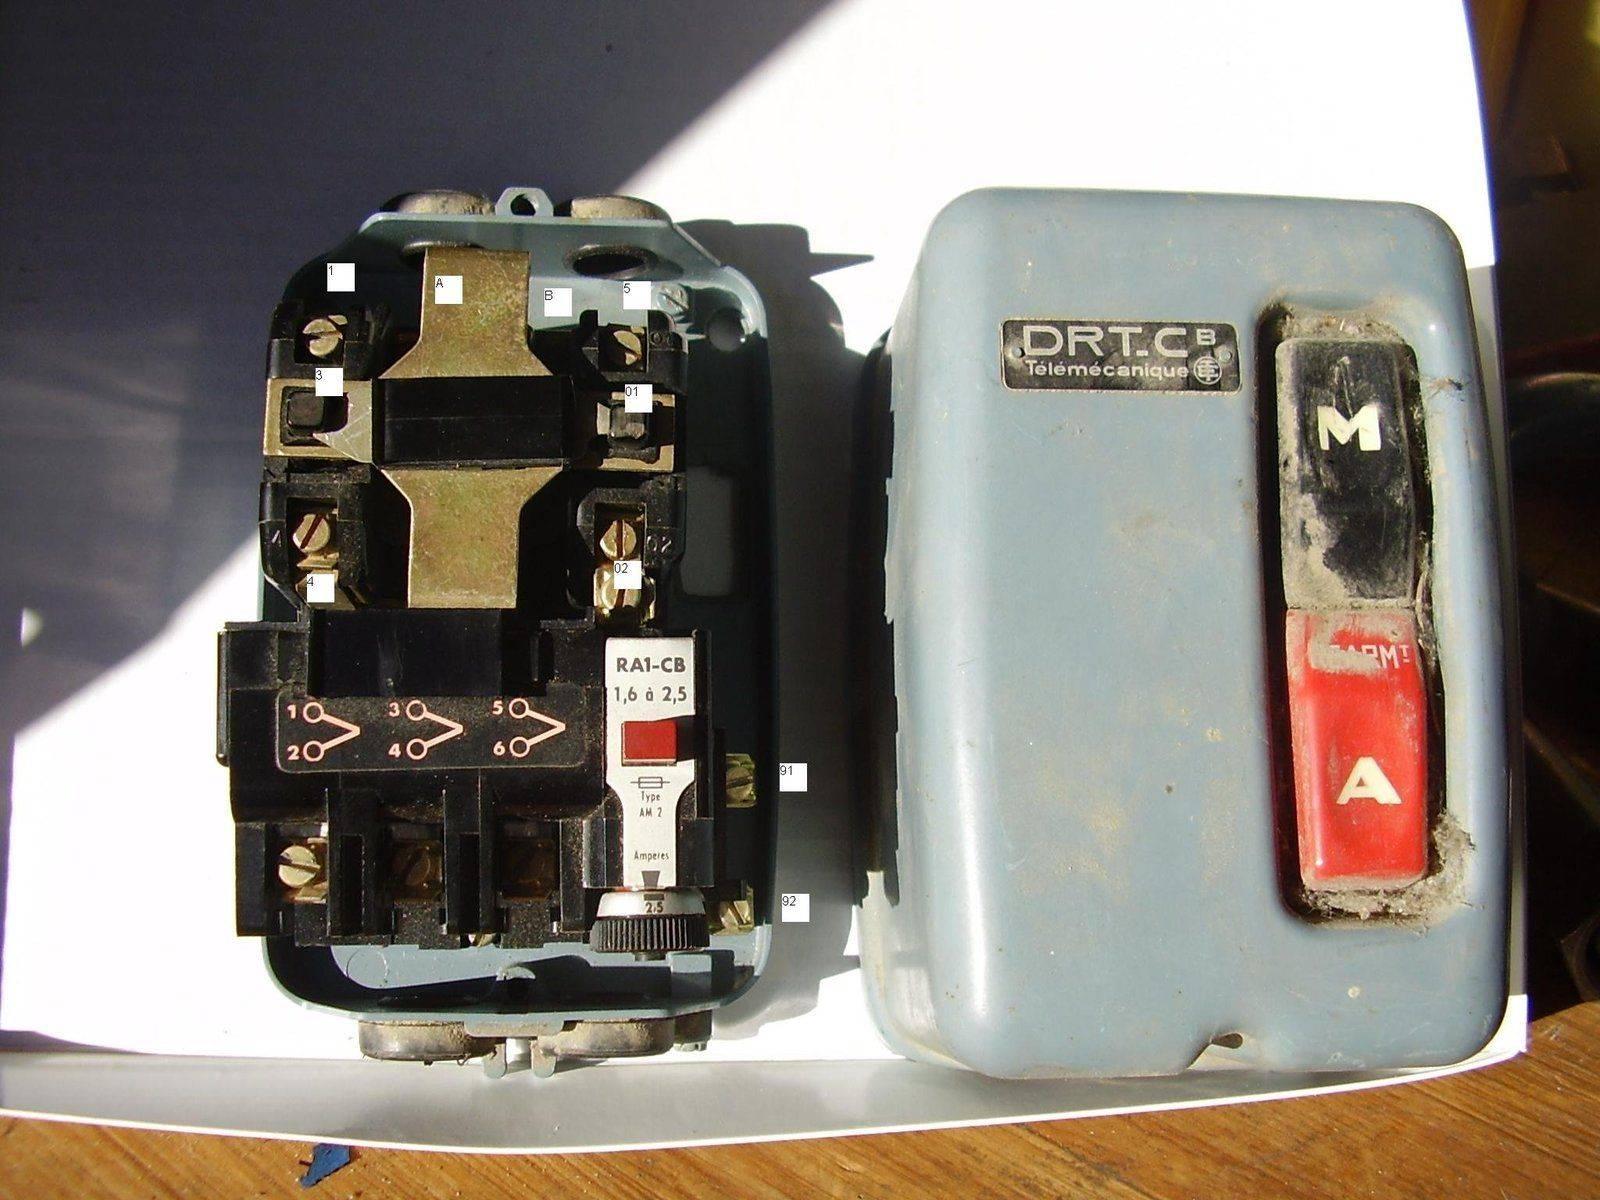 P1110251.JPG